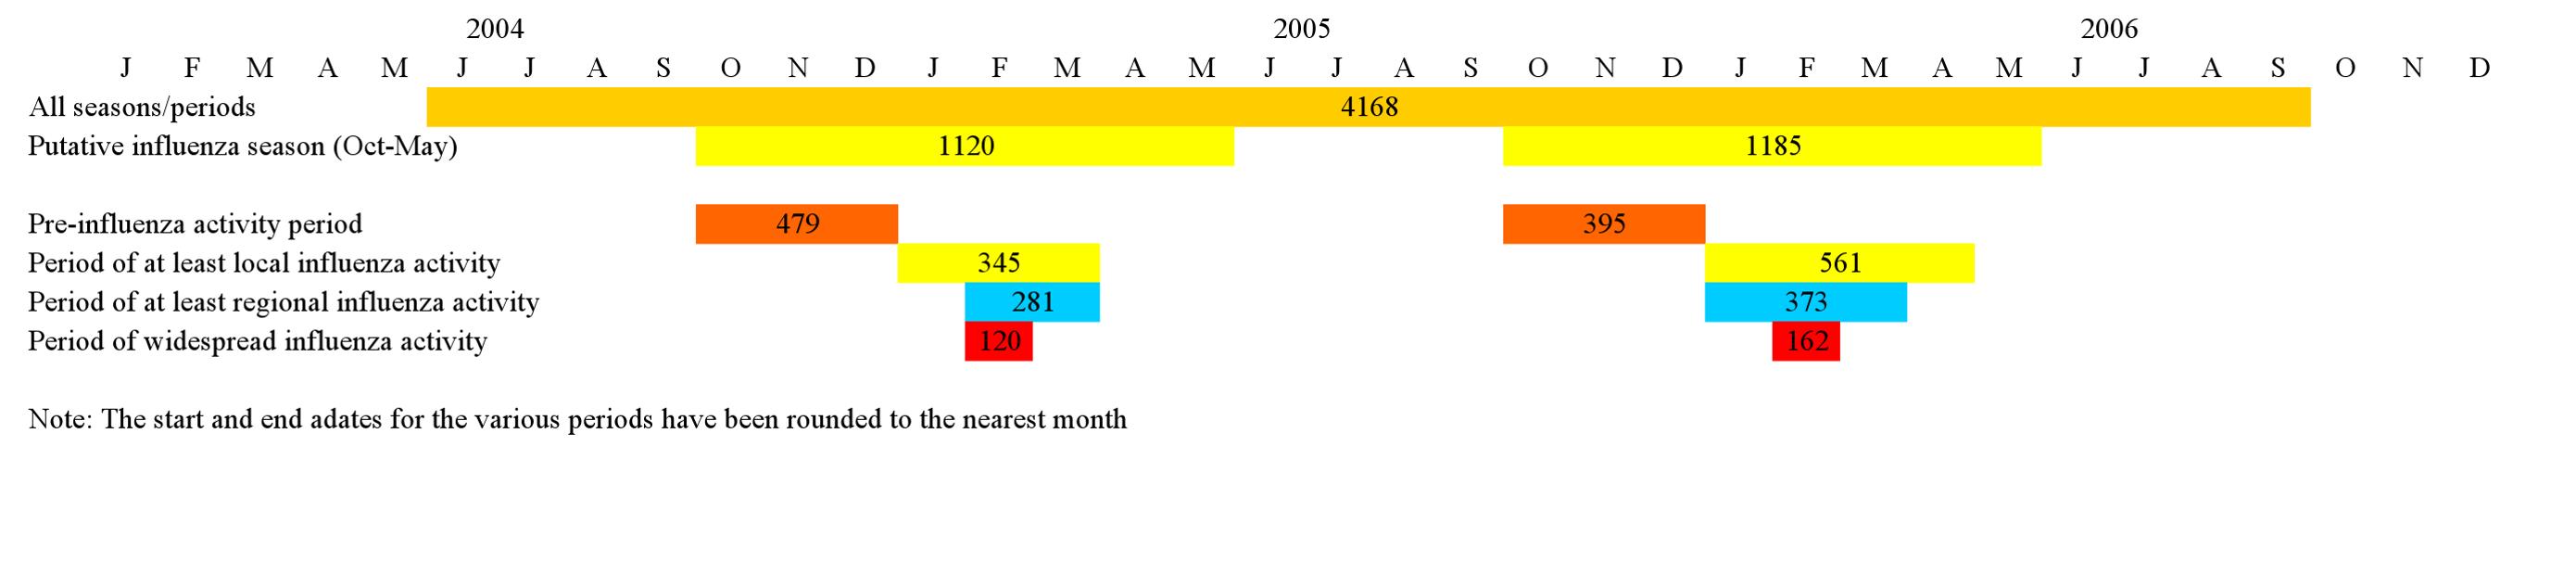 Influenza activity/analysis periods.